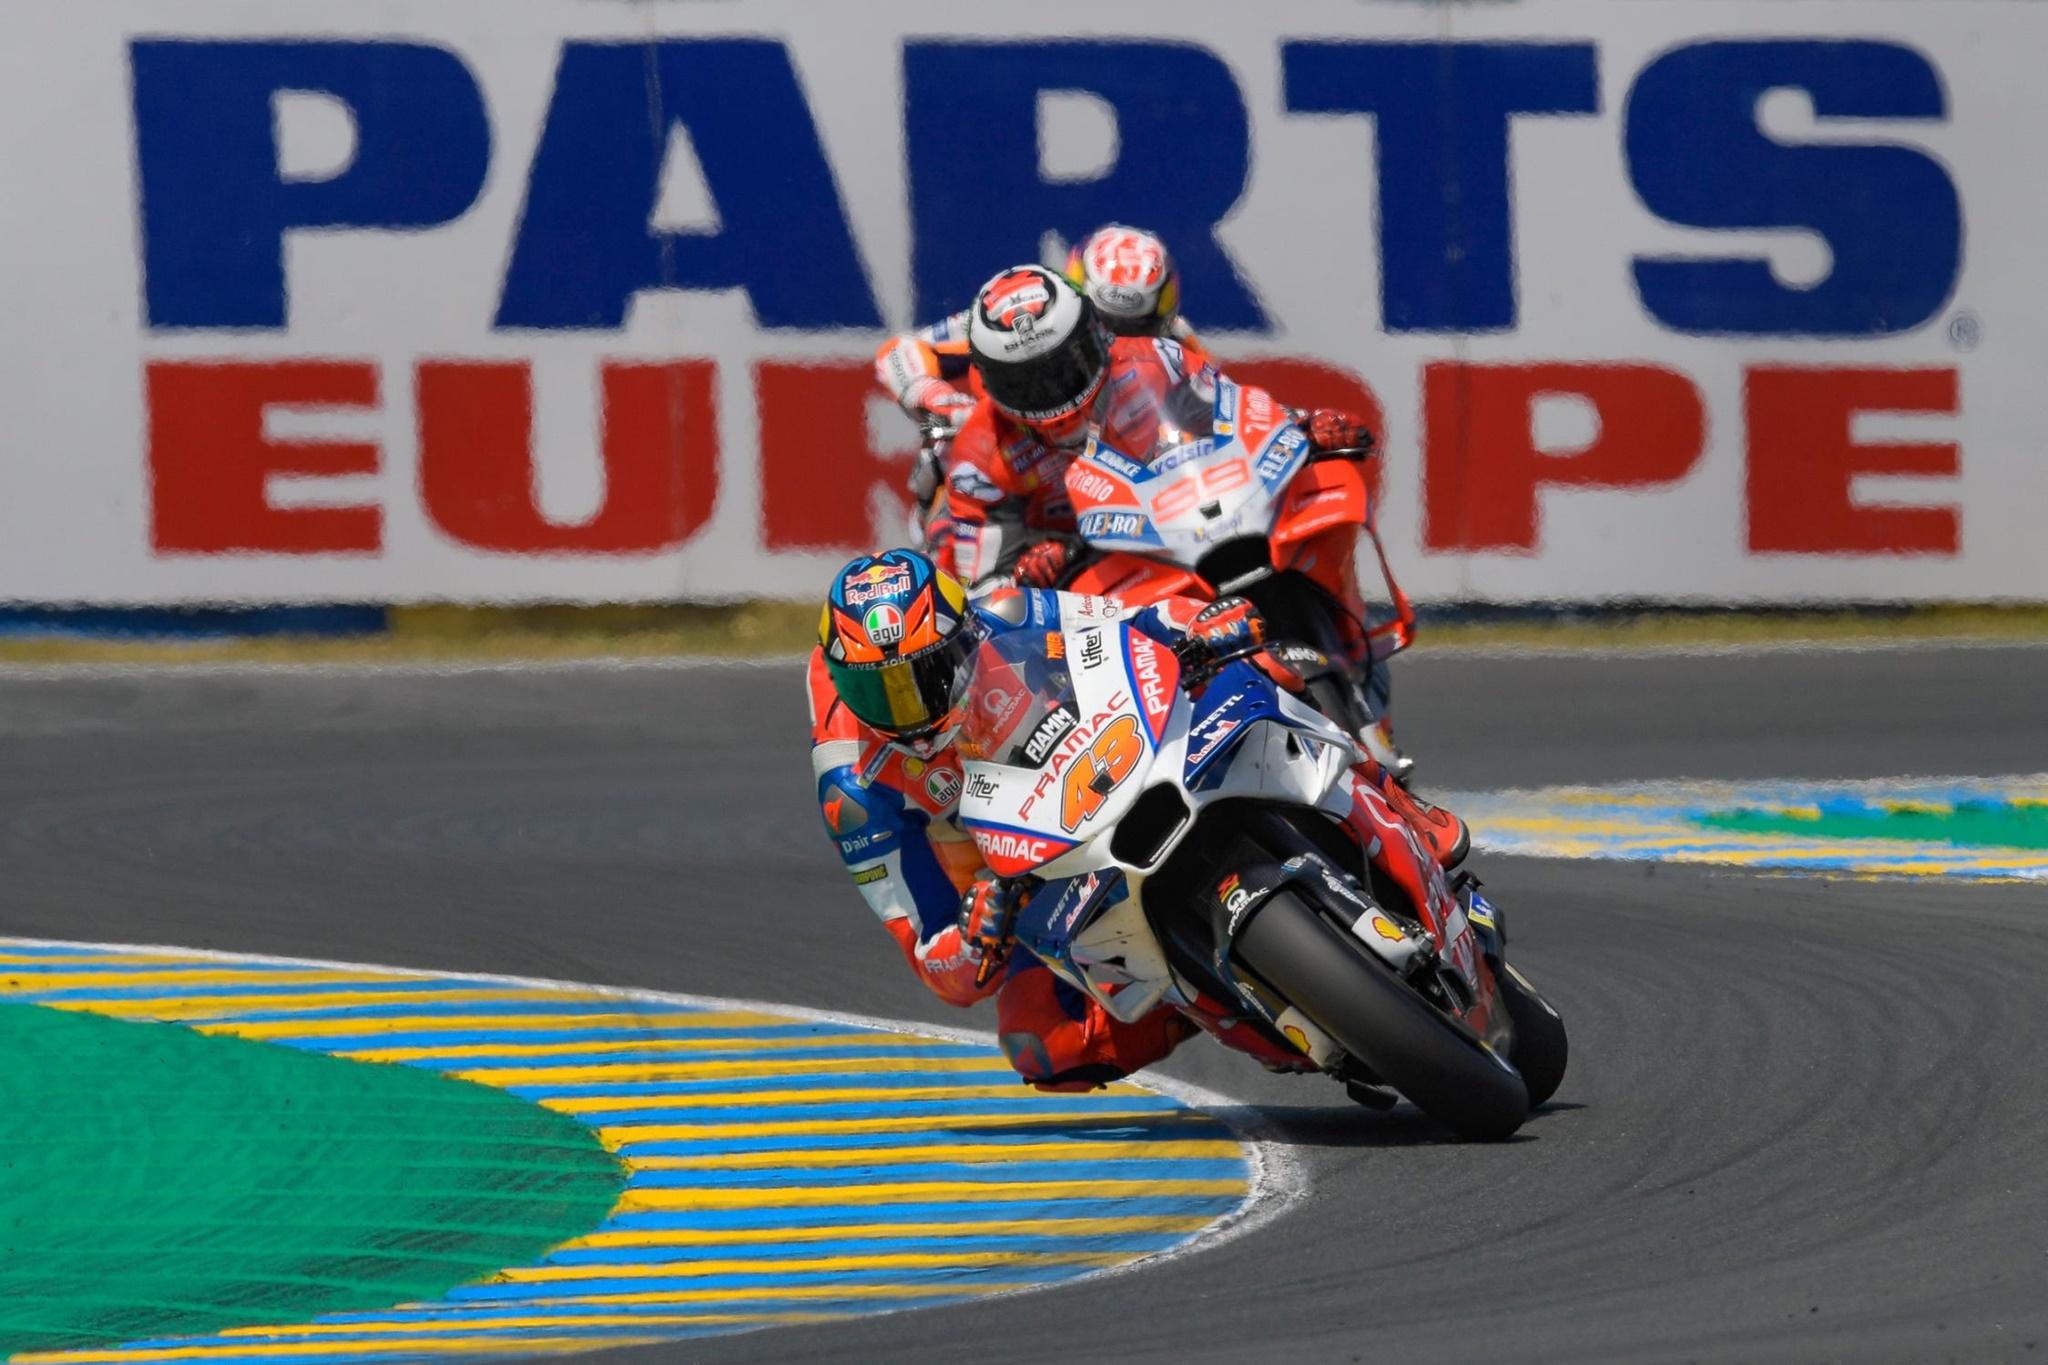 Moto_GP_18_Le_Mans_2018_Xe_Tinhte-018.jpg